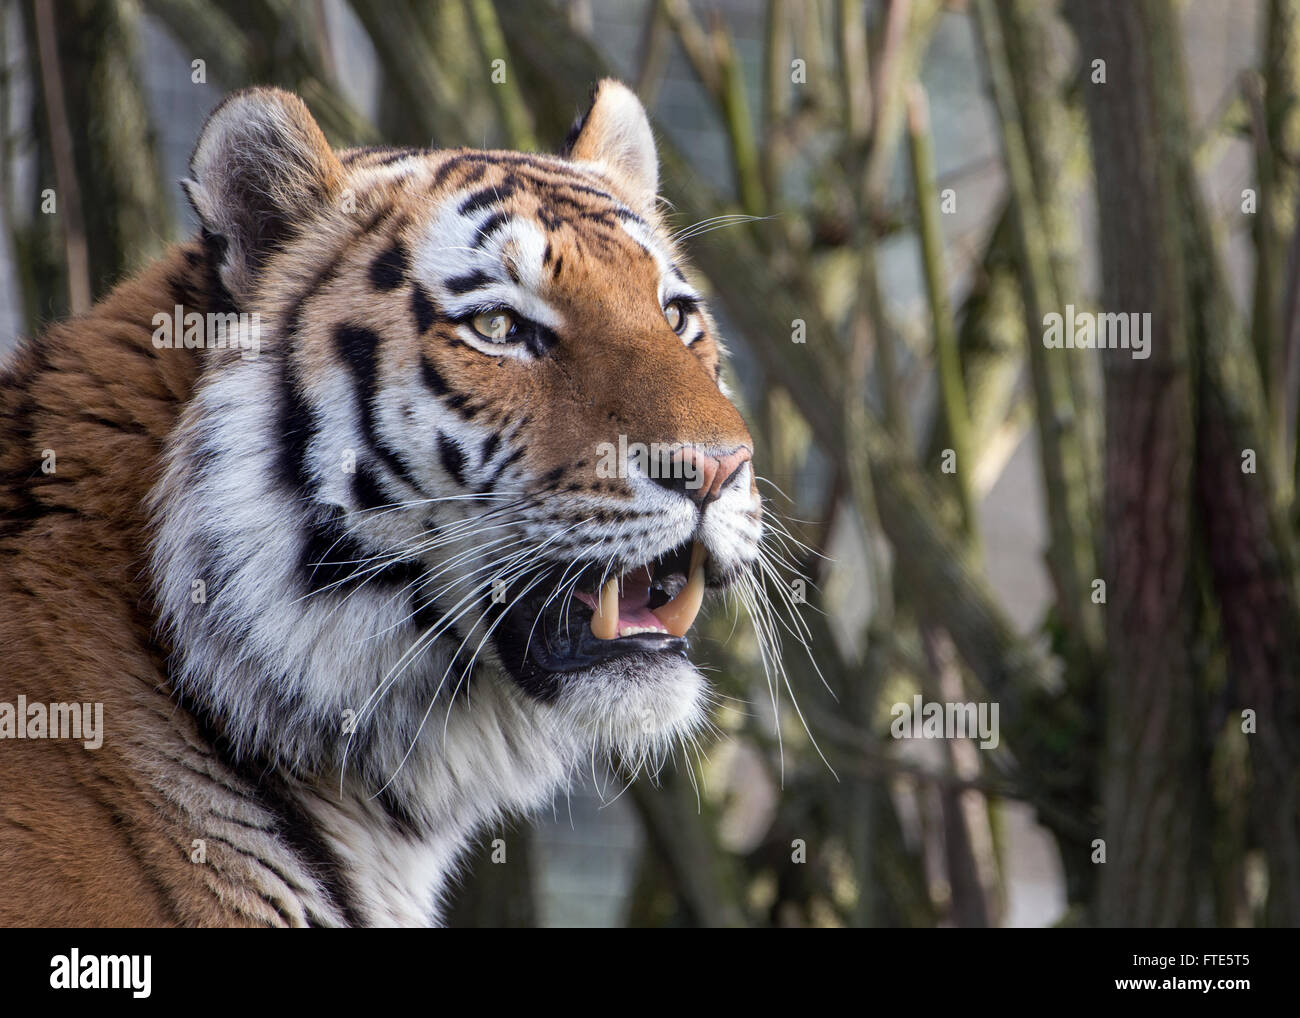 Maschio (Amur Siberian) tiger Foto Stock